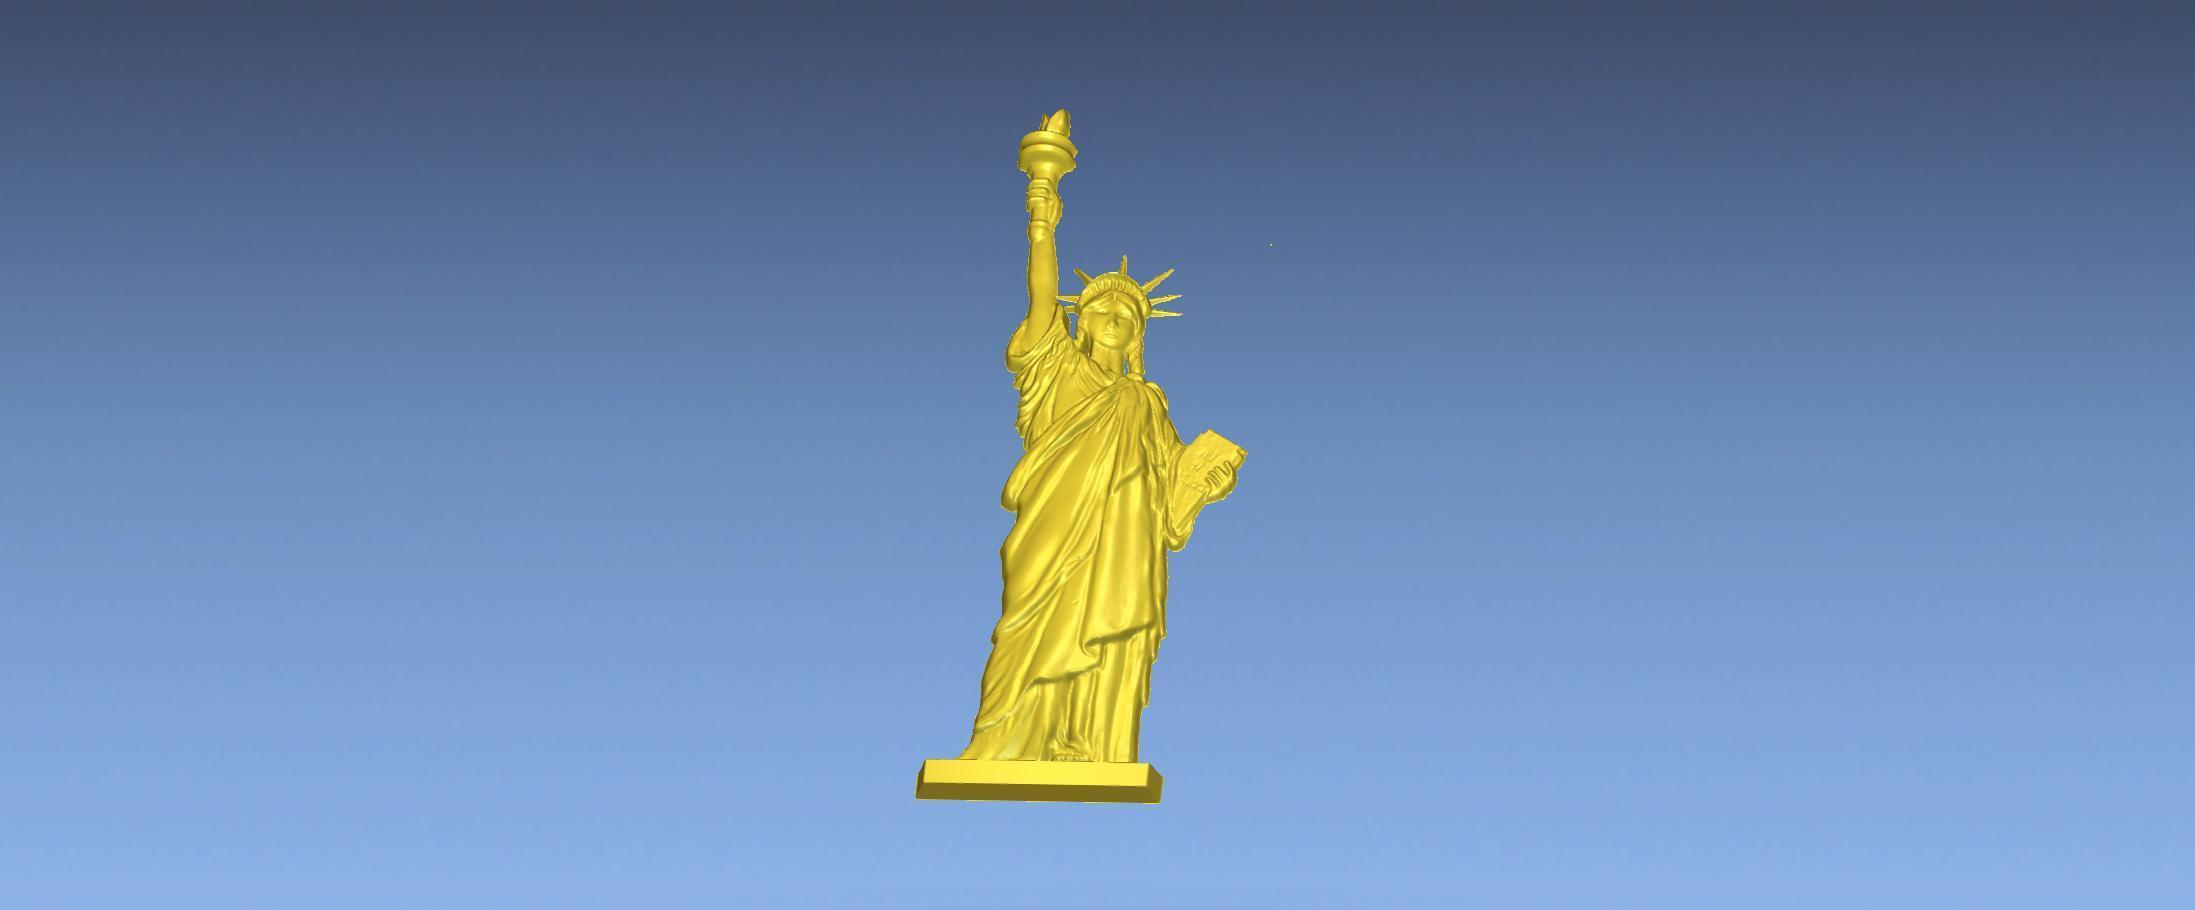 5.jpg Download free STL file LIBRETY STATUE 3D STL FILE • 3D printing design, ALPHA_MENA